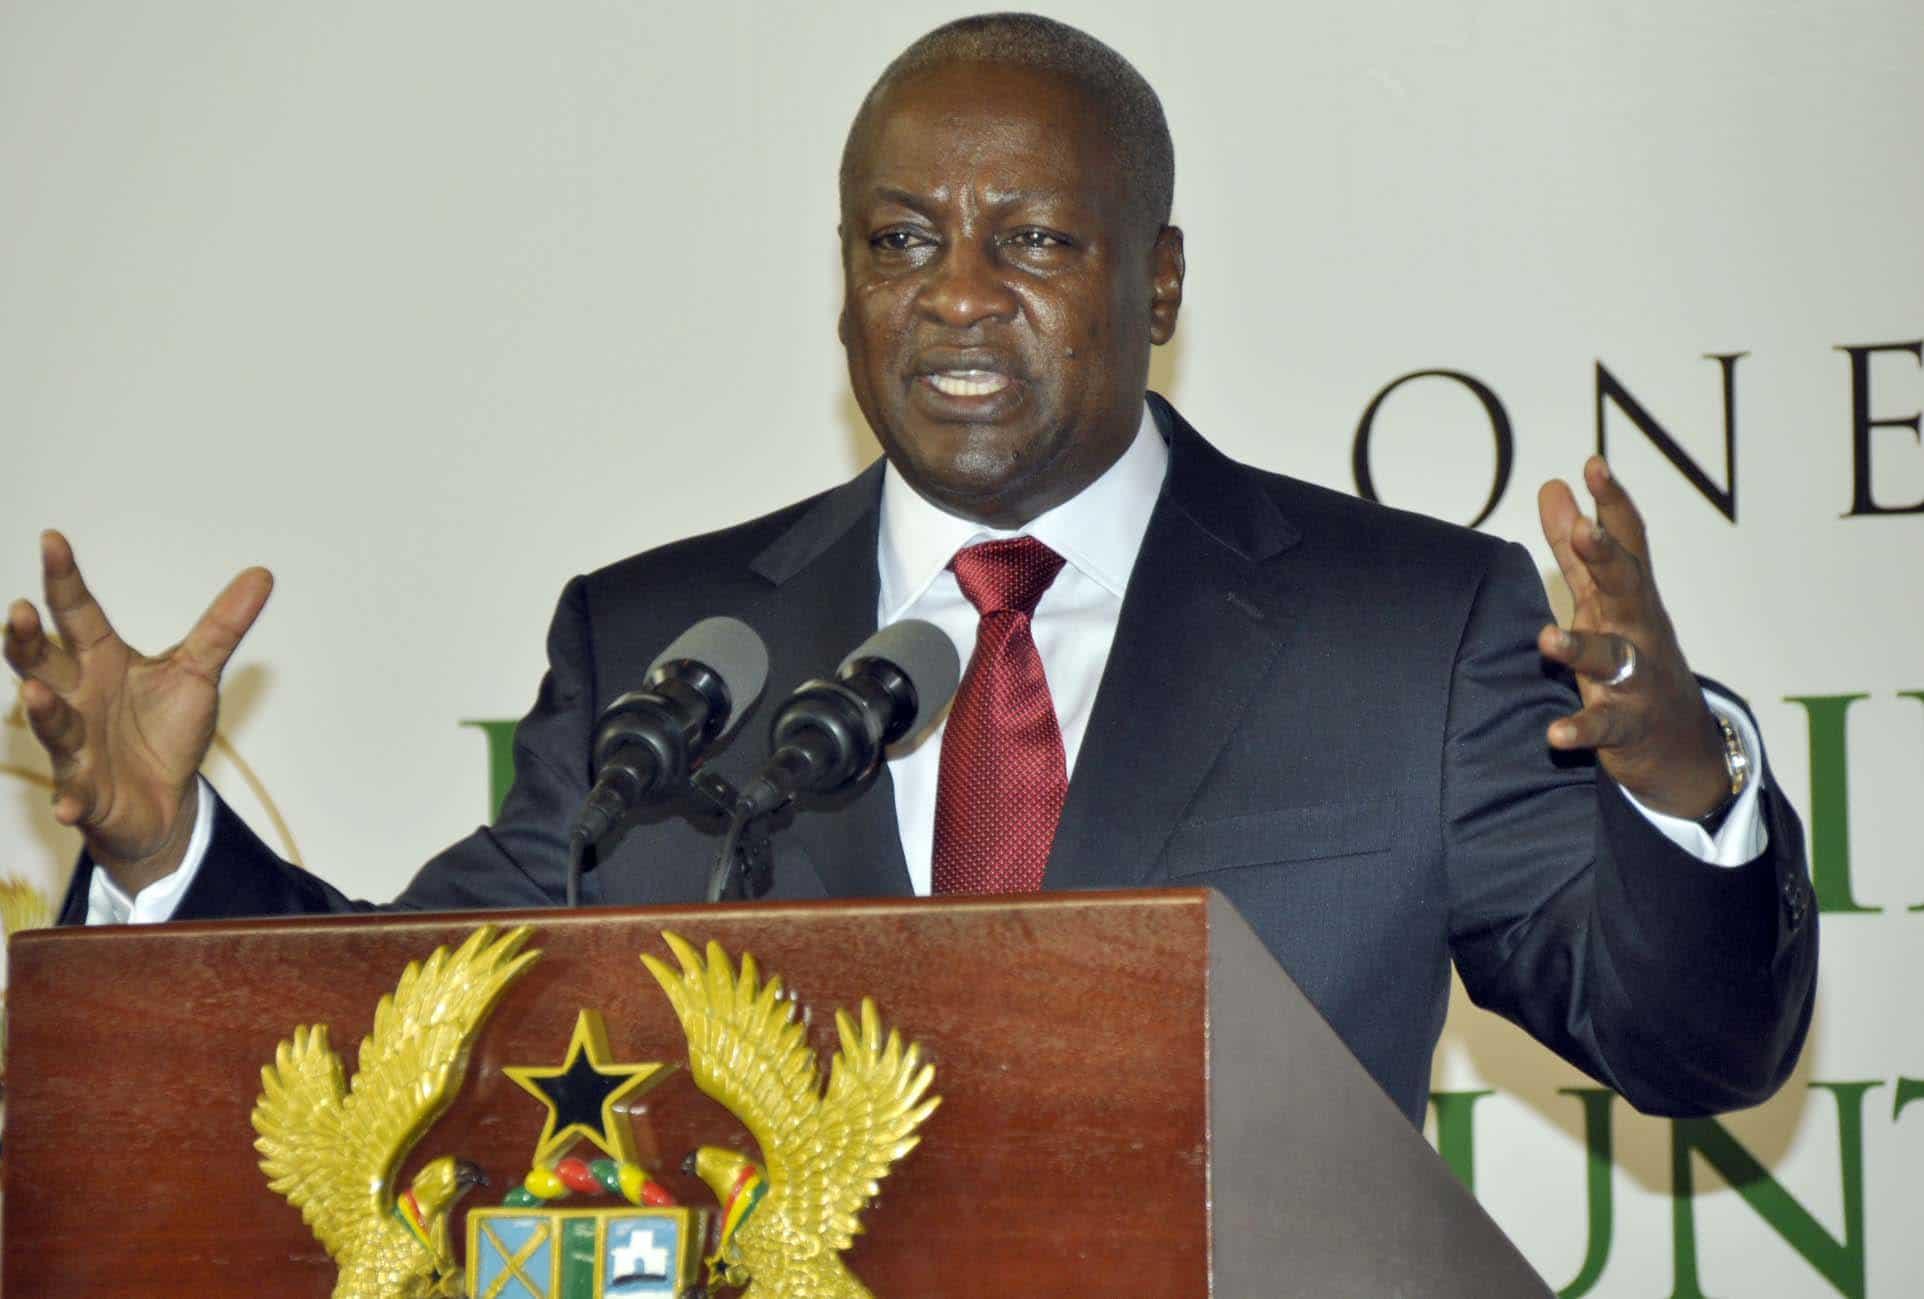 Ghanaian President, John Dramani Mahama